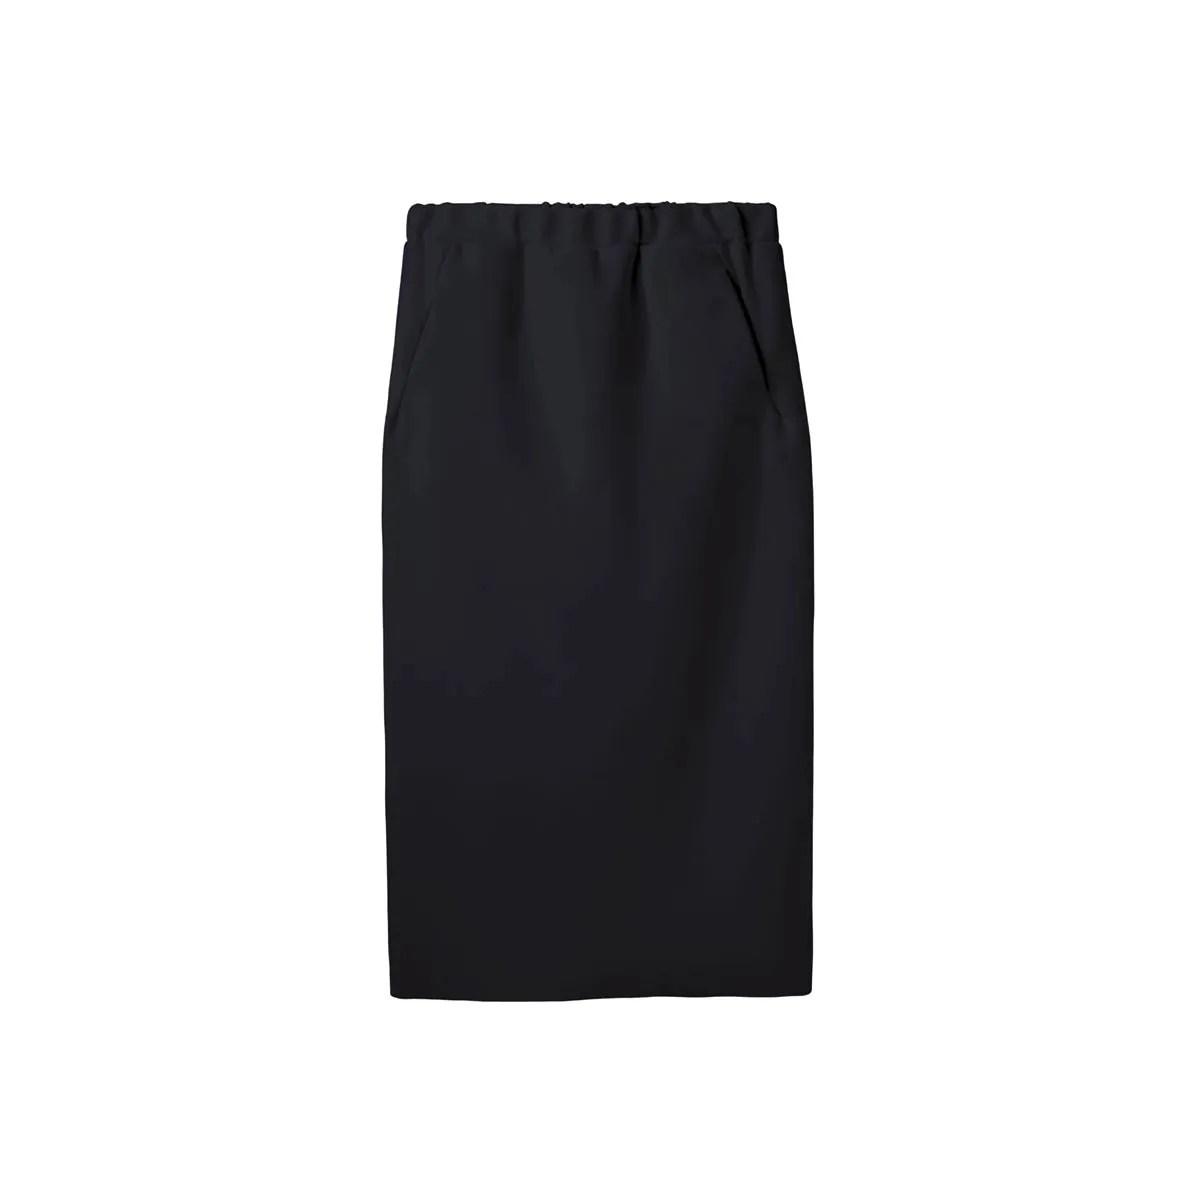 The Midi-Skirt